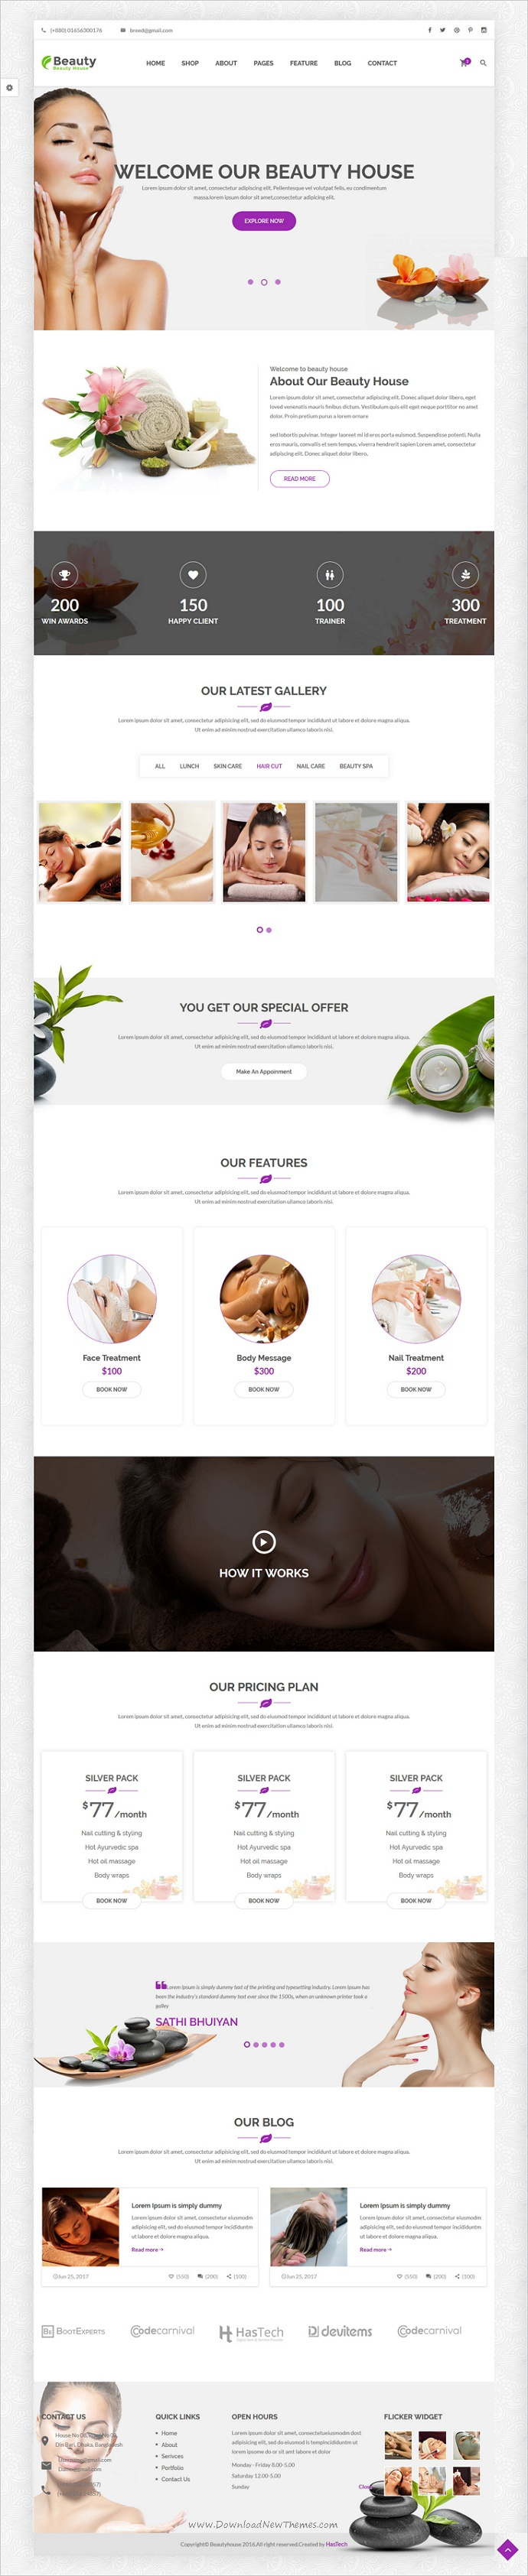 Beautyhouse Health & Beauty HTML Template House of